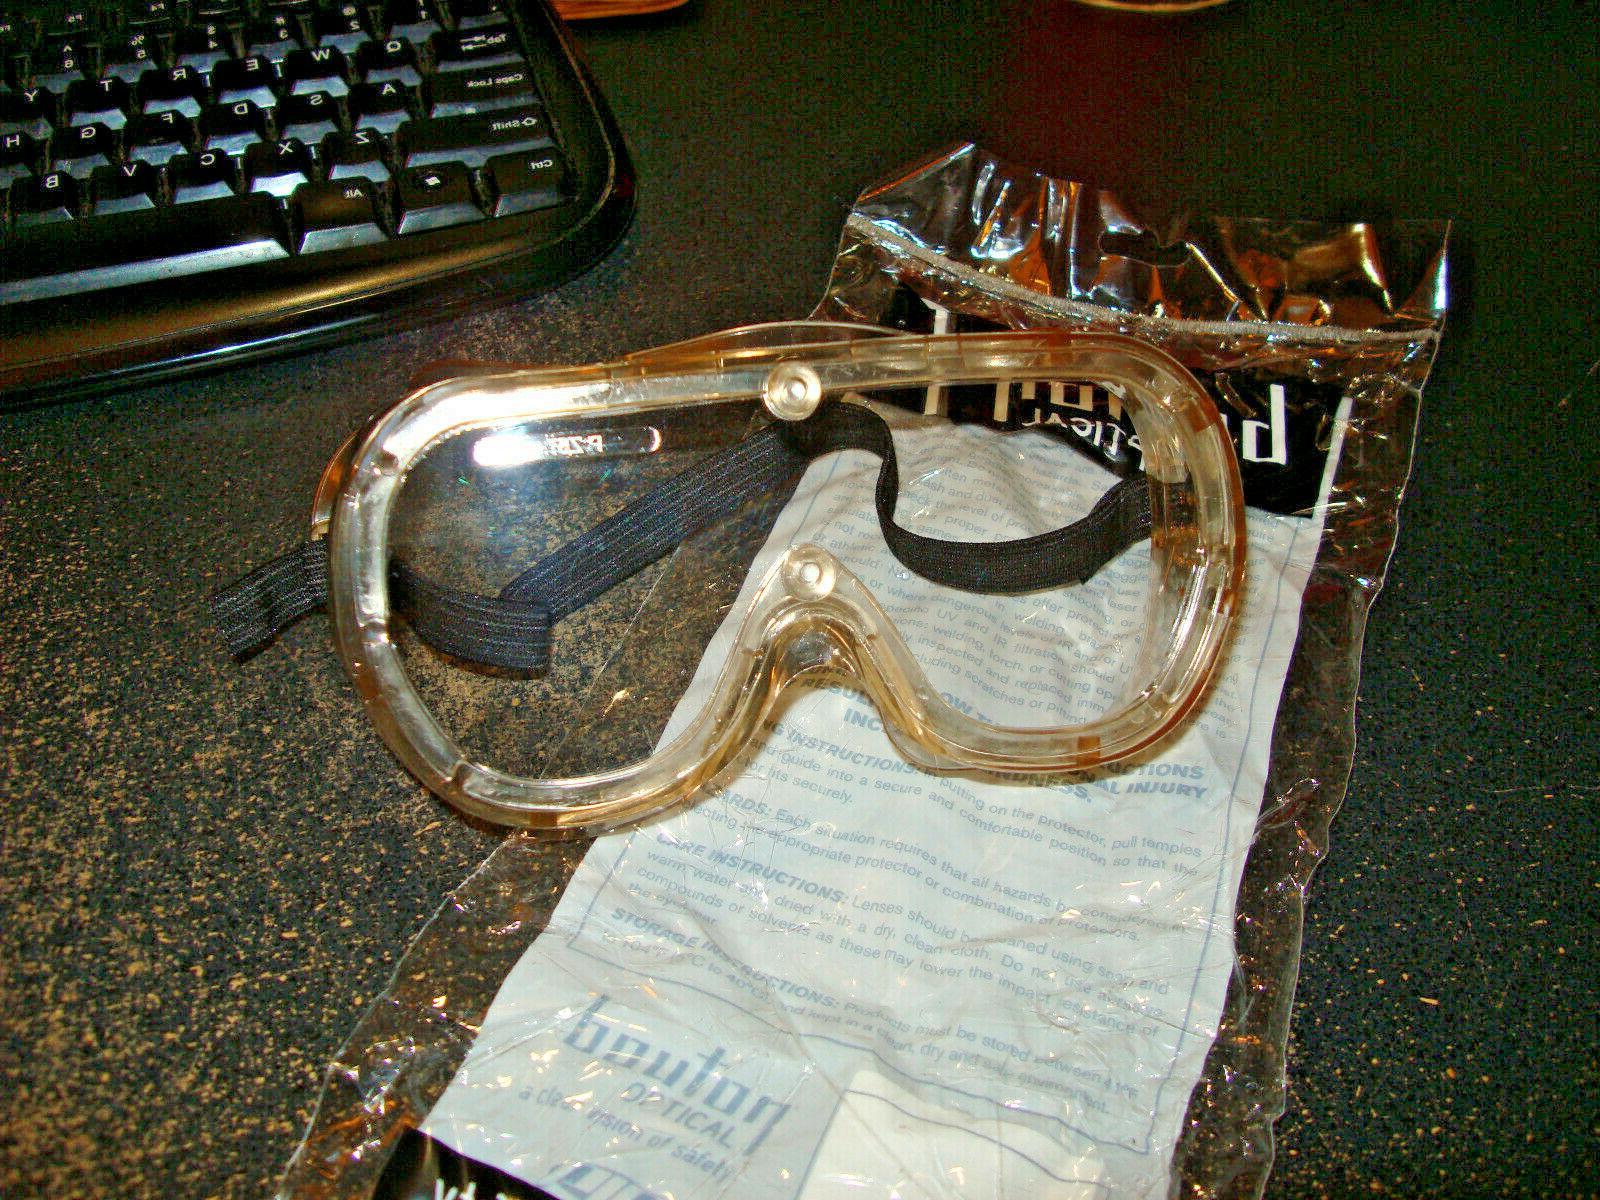 2 - Protective Eye Sealed Lab Eye Protection